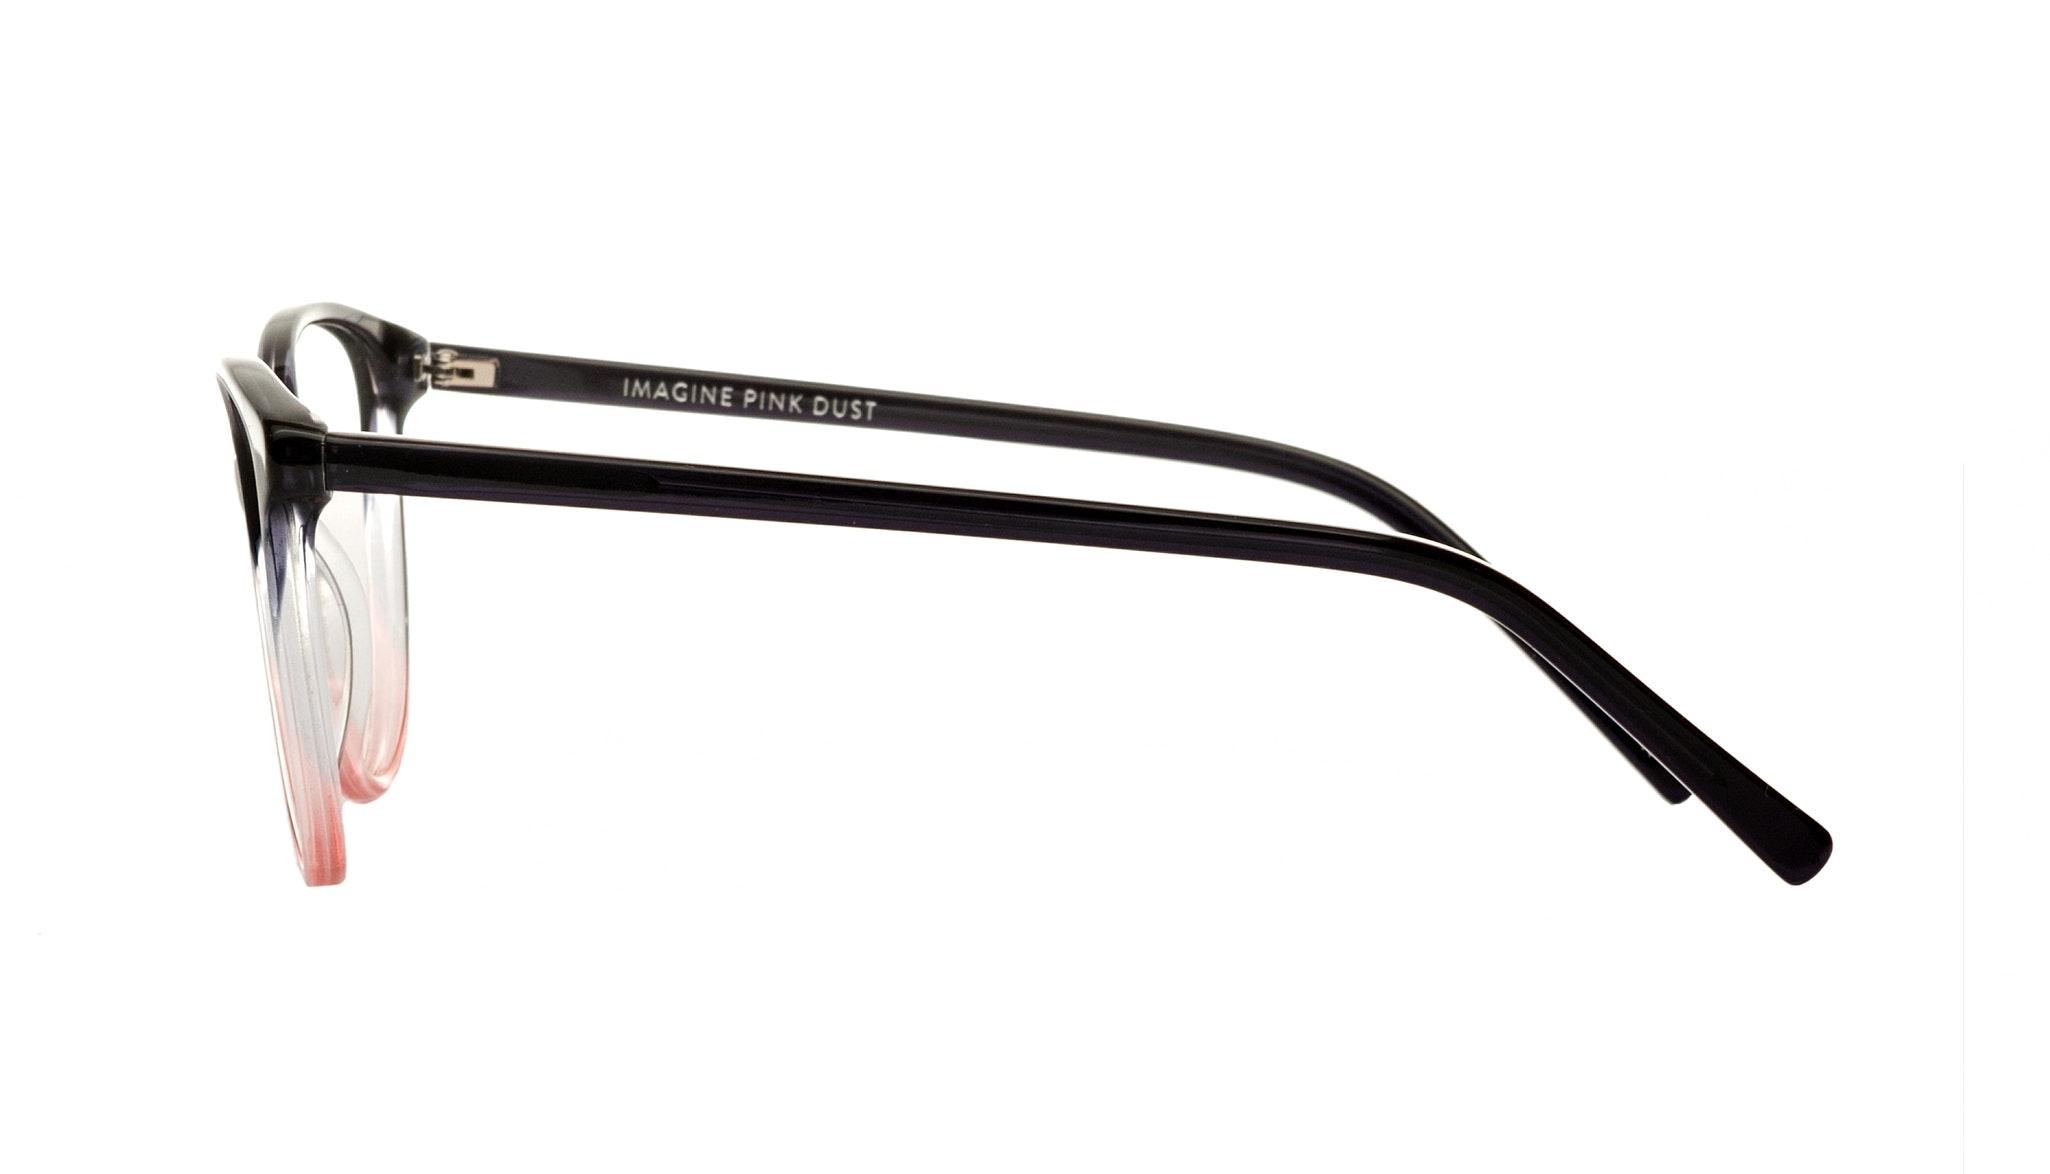 Affordable Fashion Glasses Cat Eye Round Eyeglasses Women Imagine Pink Dust Side